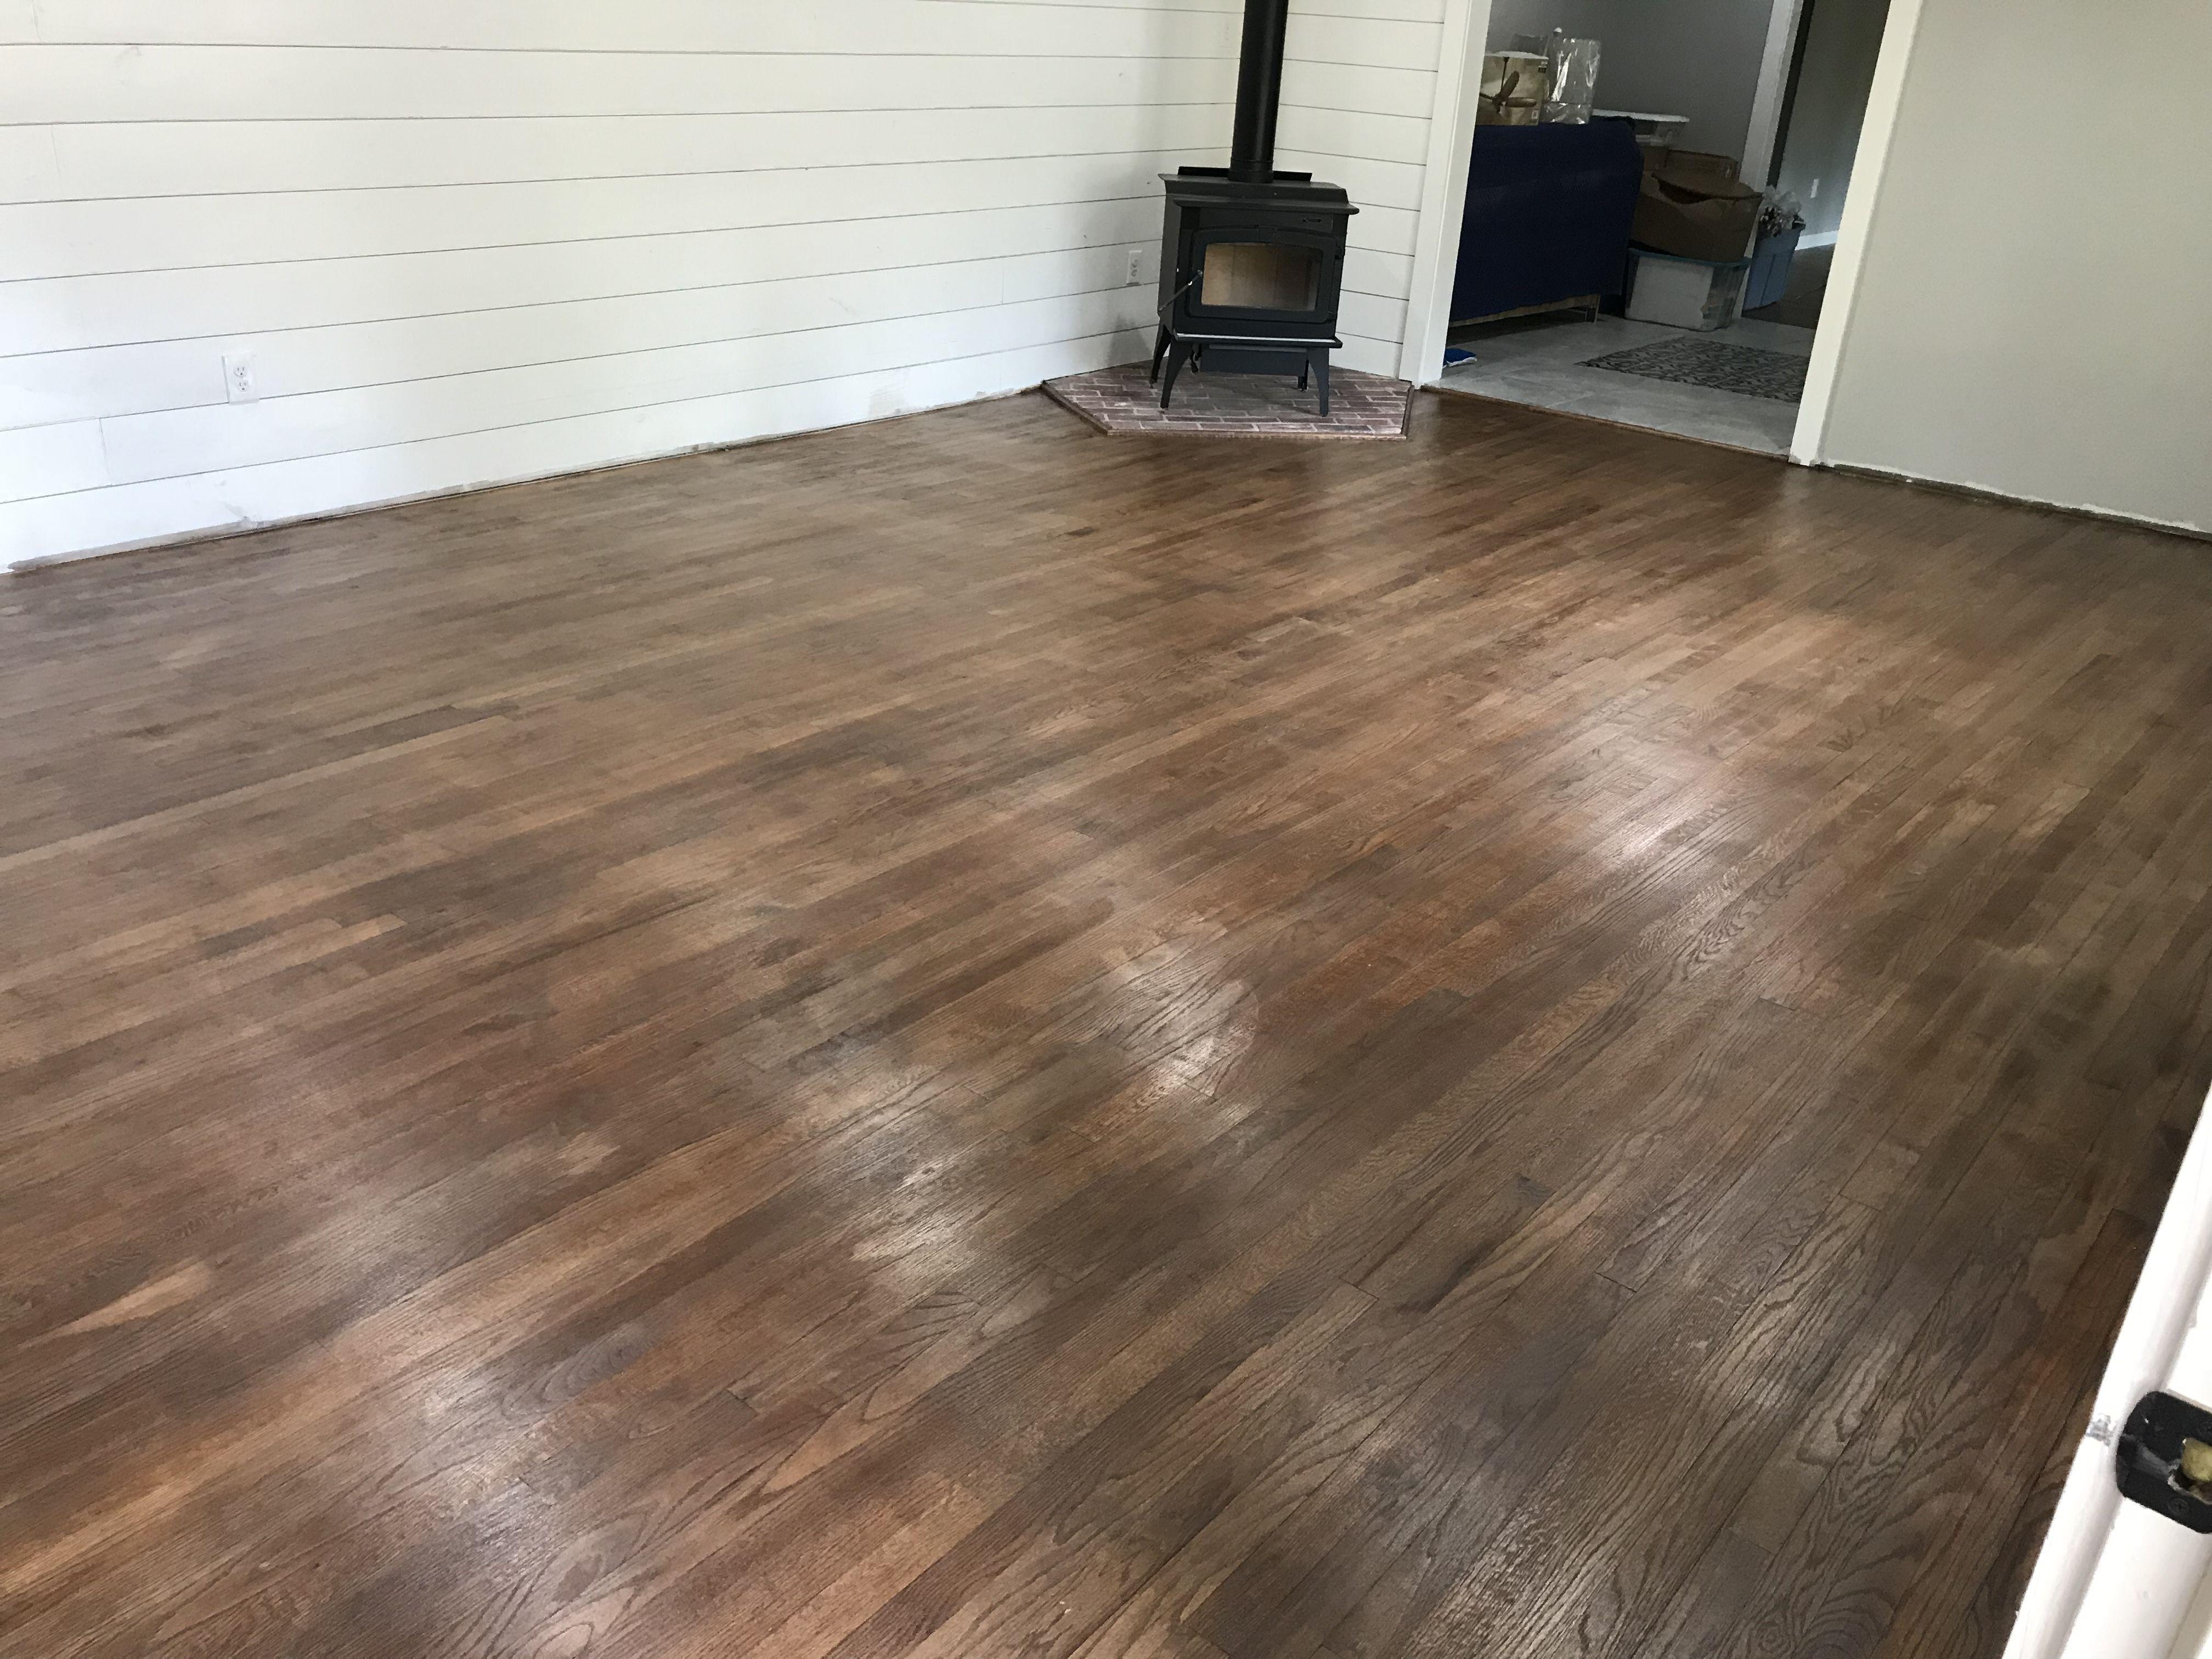 Final Special Walnut Weathered Oak Stain On Redwood Flooring Hardwood Floor Colors Floor Stain Wood Floor Stain Colors